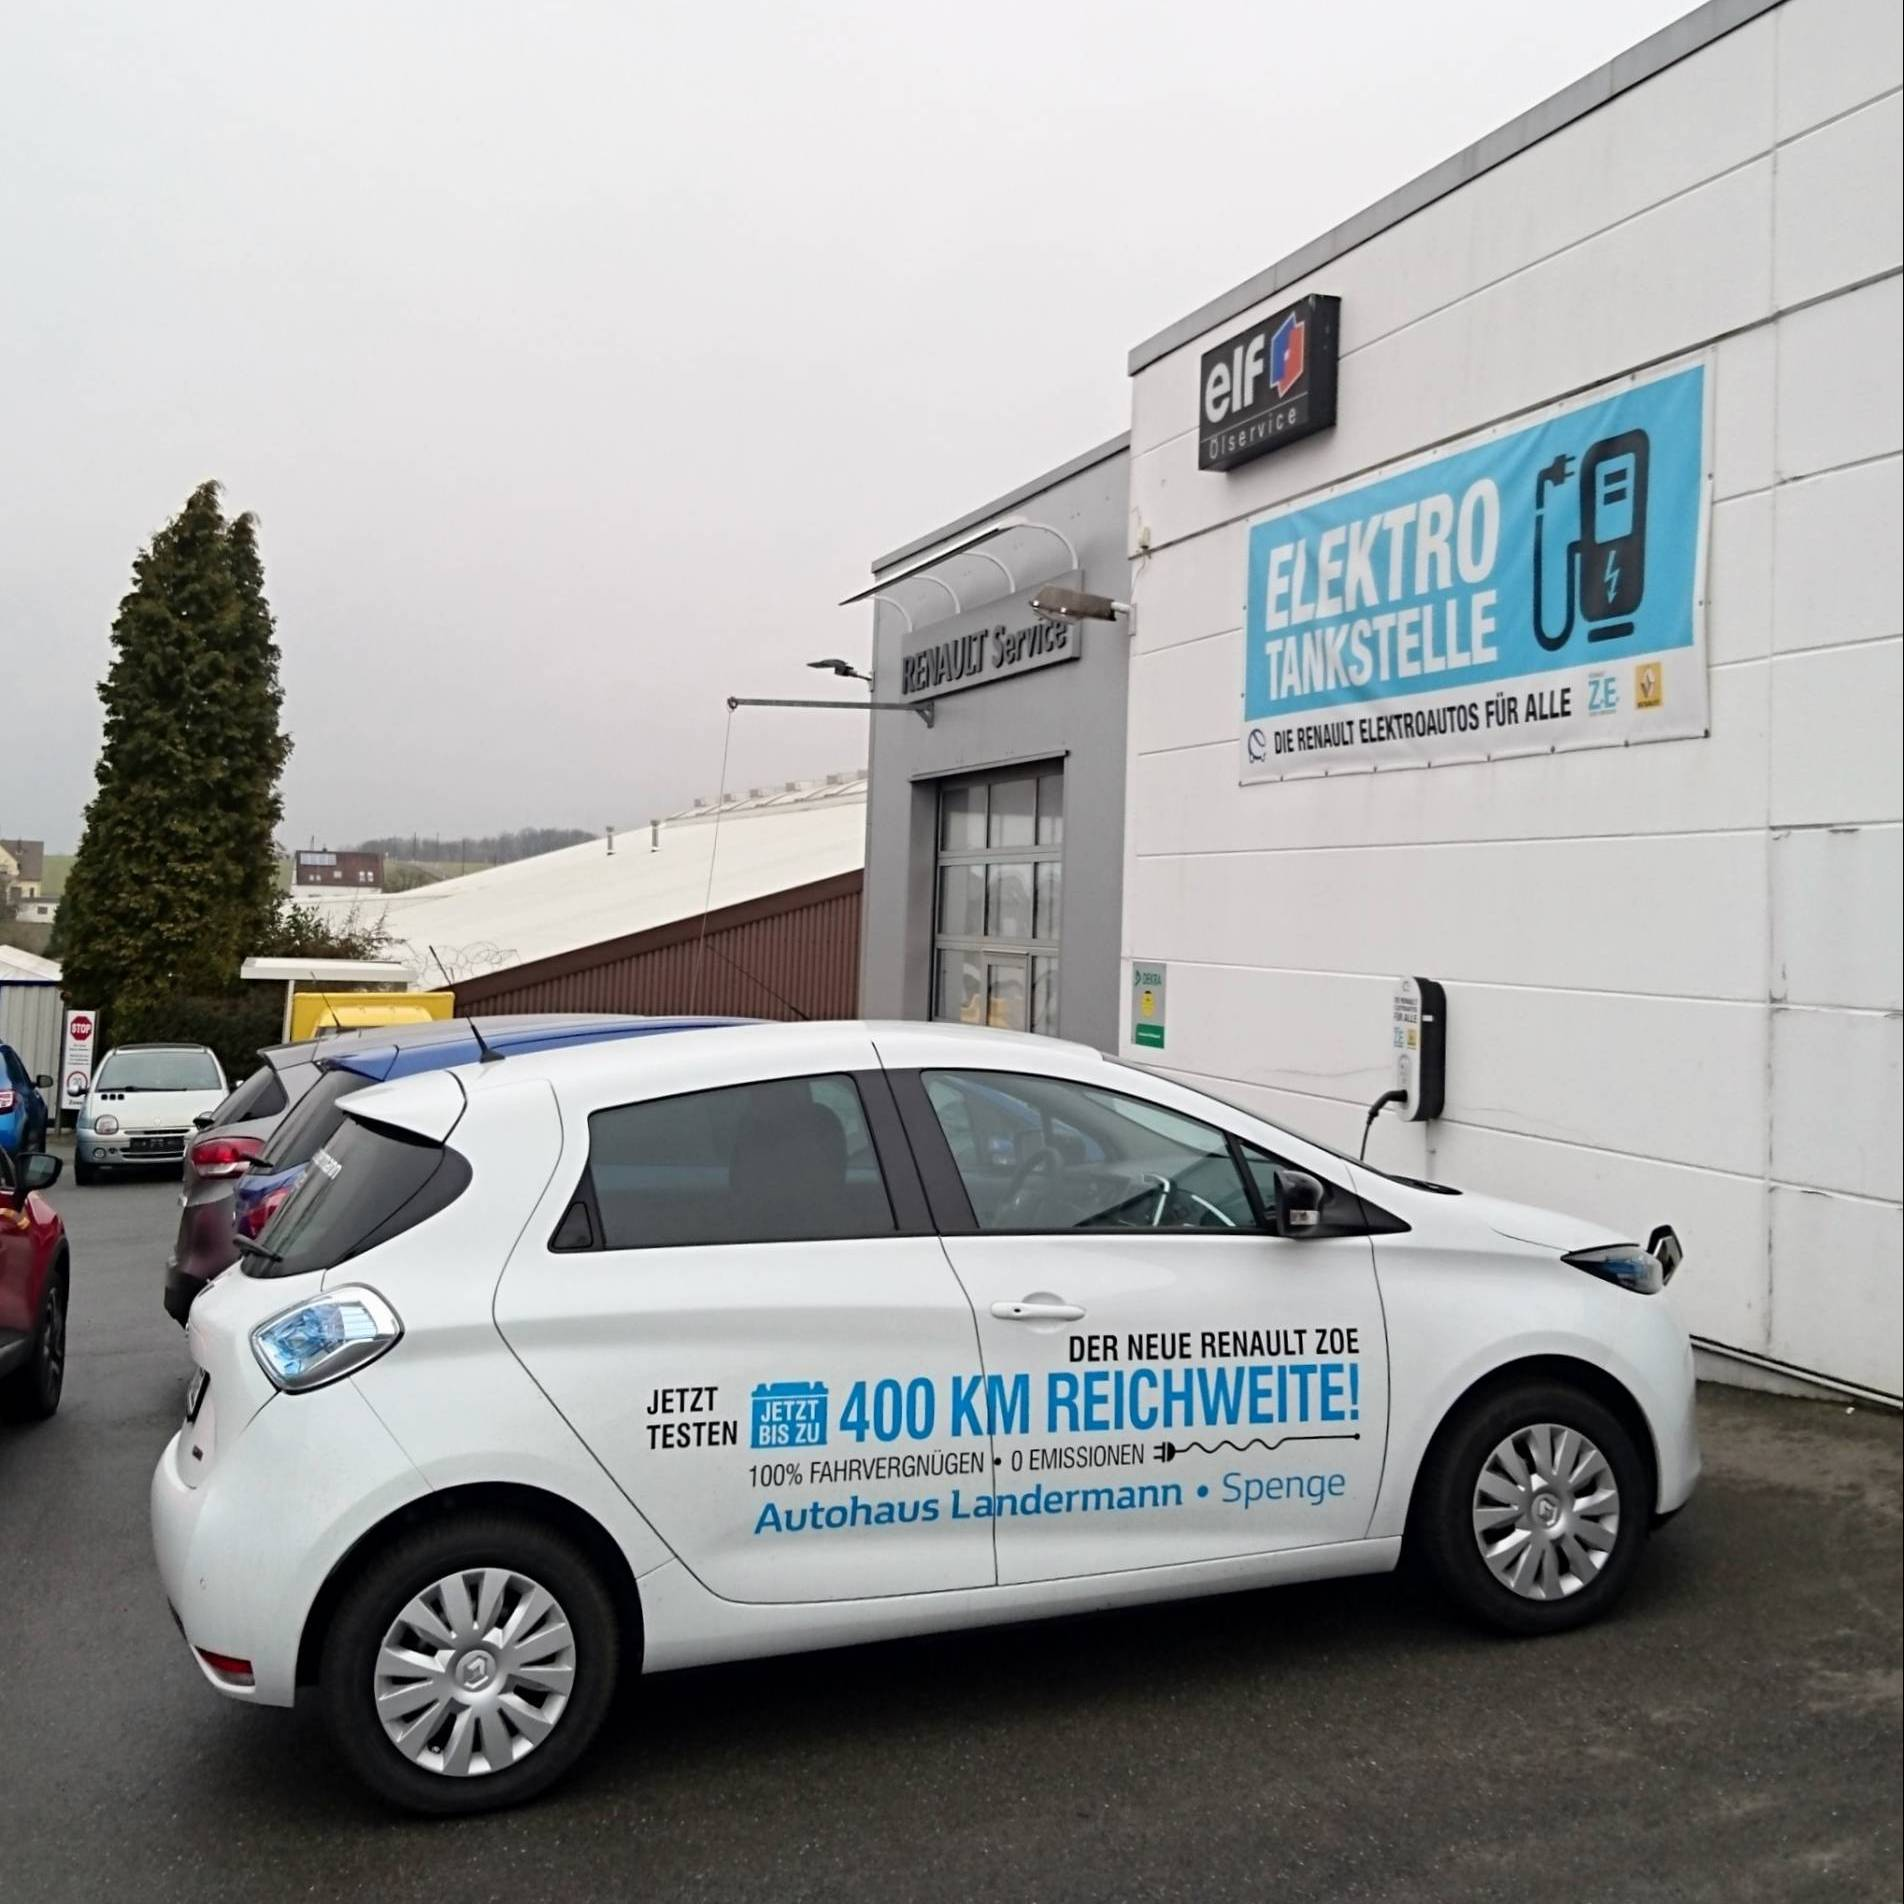 Autohaus Landermann Aussenansicht Zoe + Tankstelle